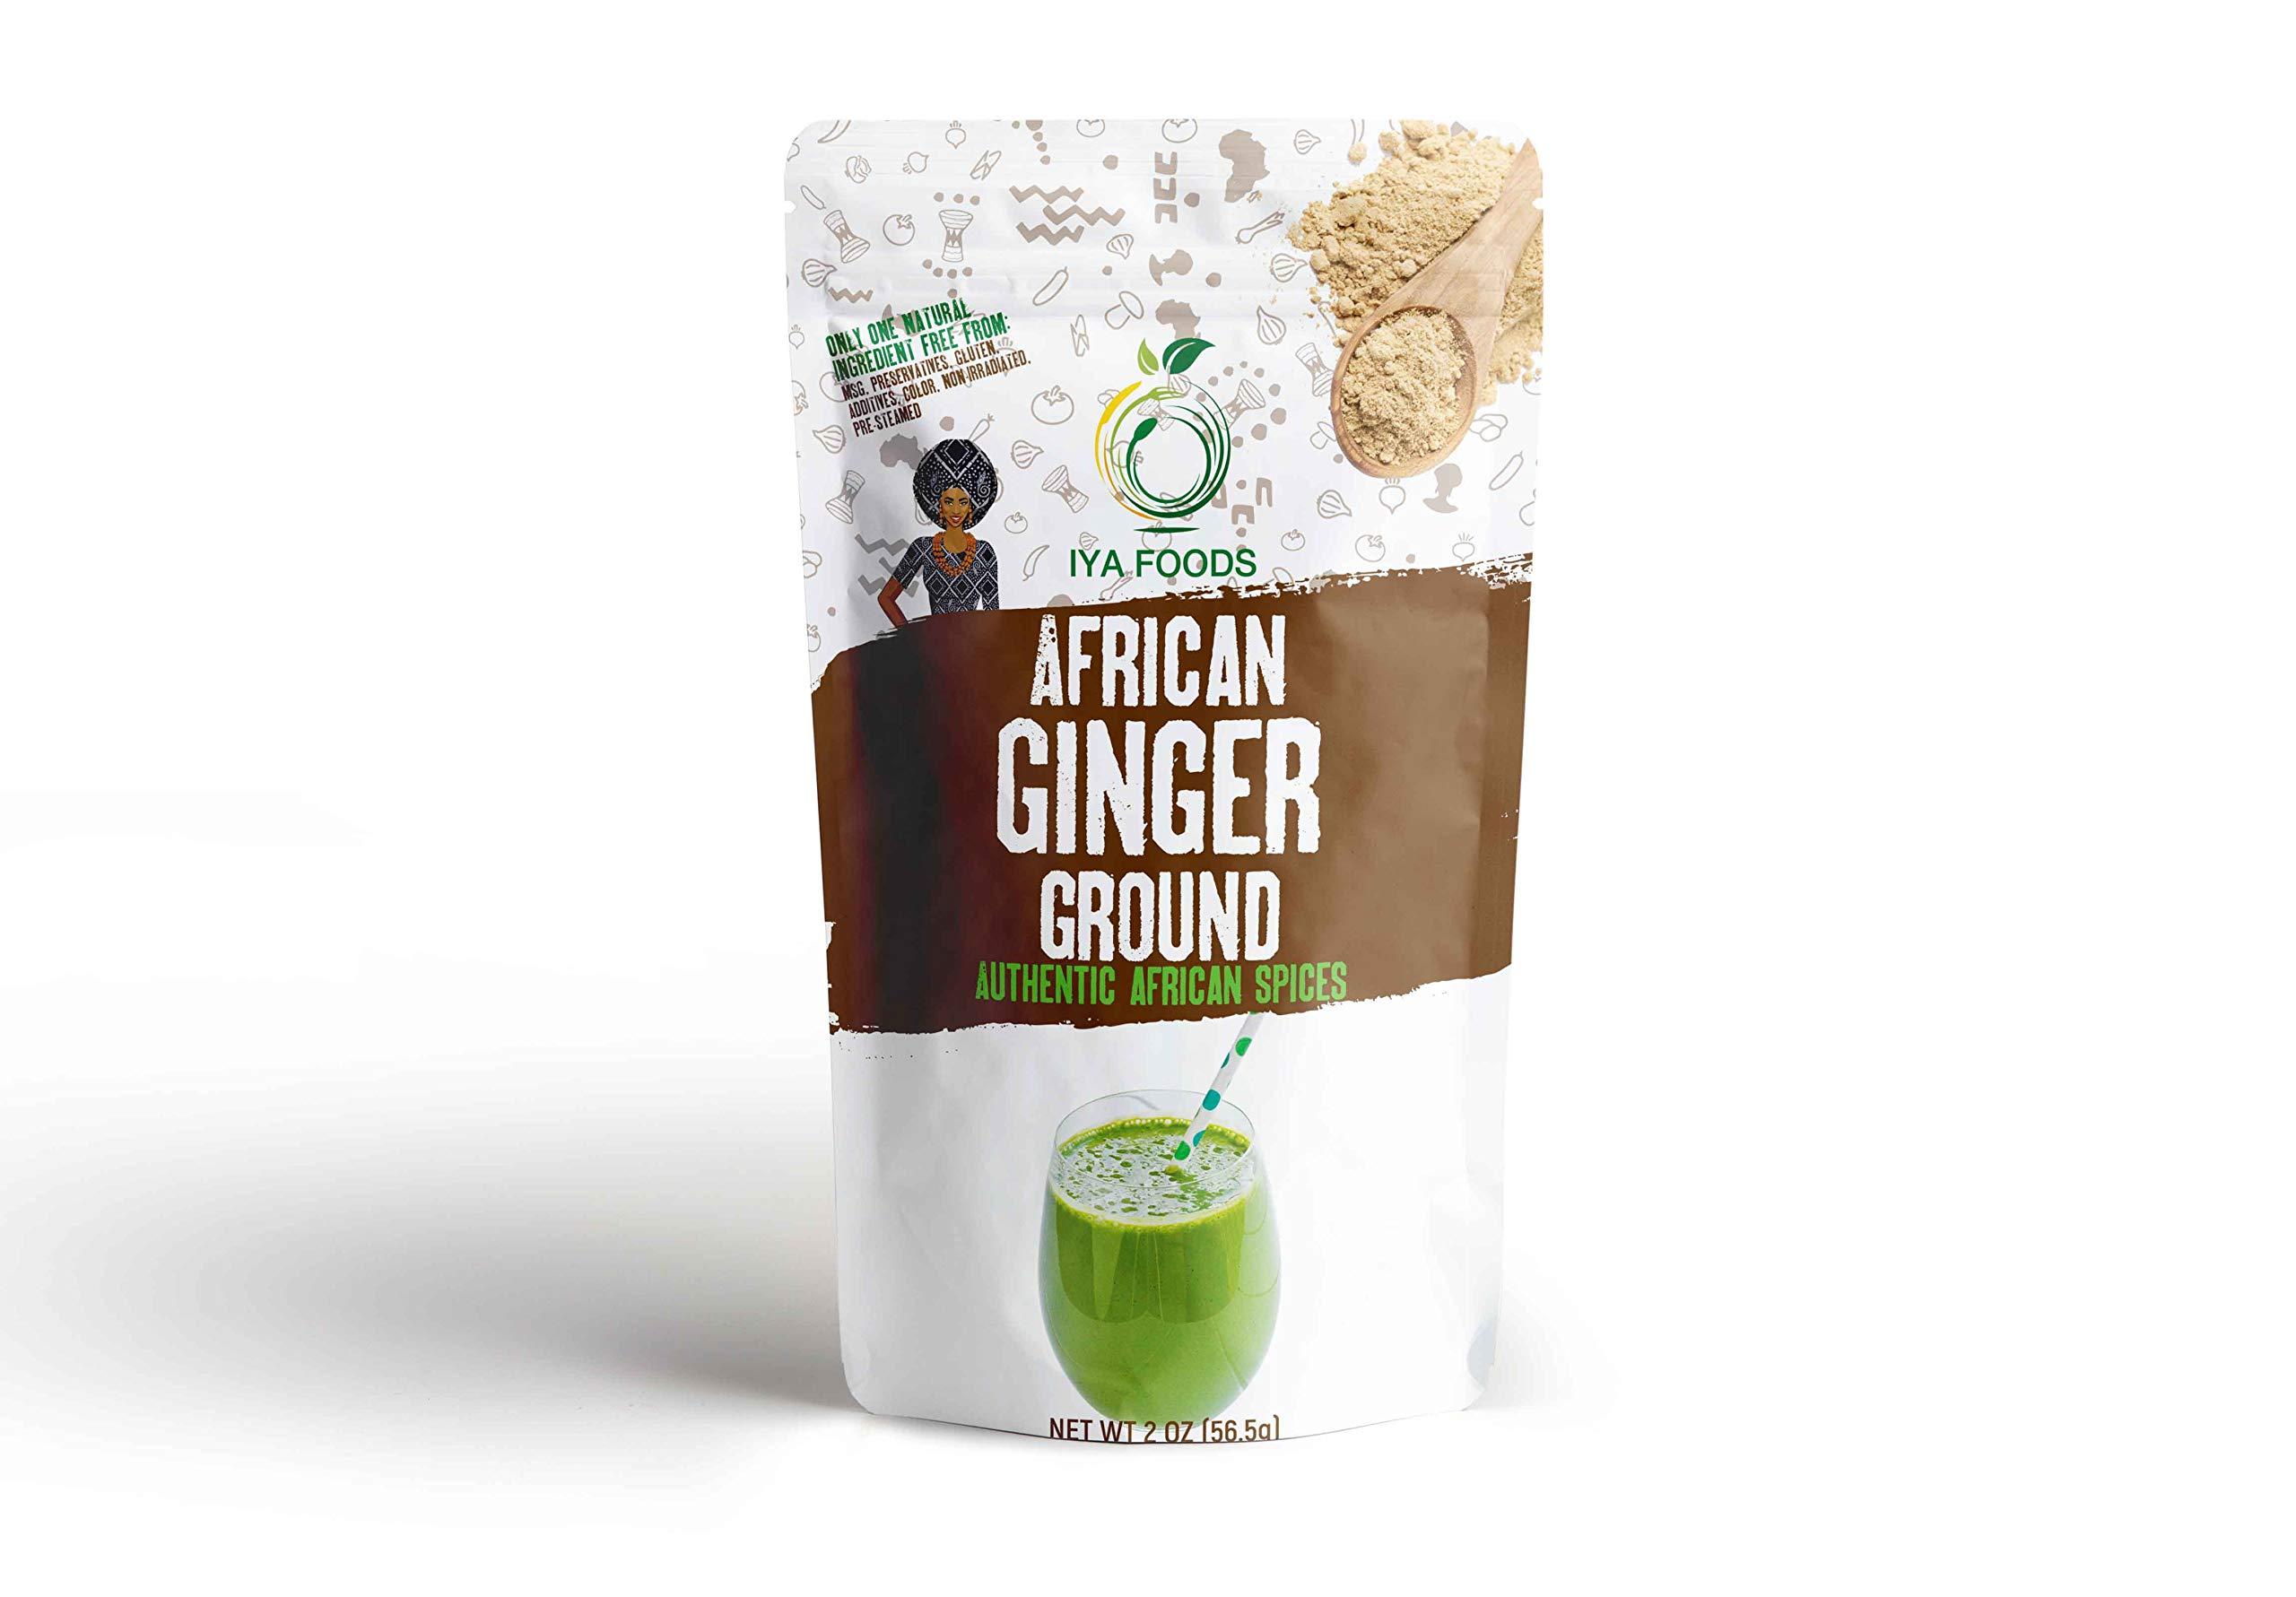 Iya Foods Ginger Ground 2 ounces, Kosher Certified, No Preservatives, No Added Color, No Additives, No MSG